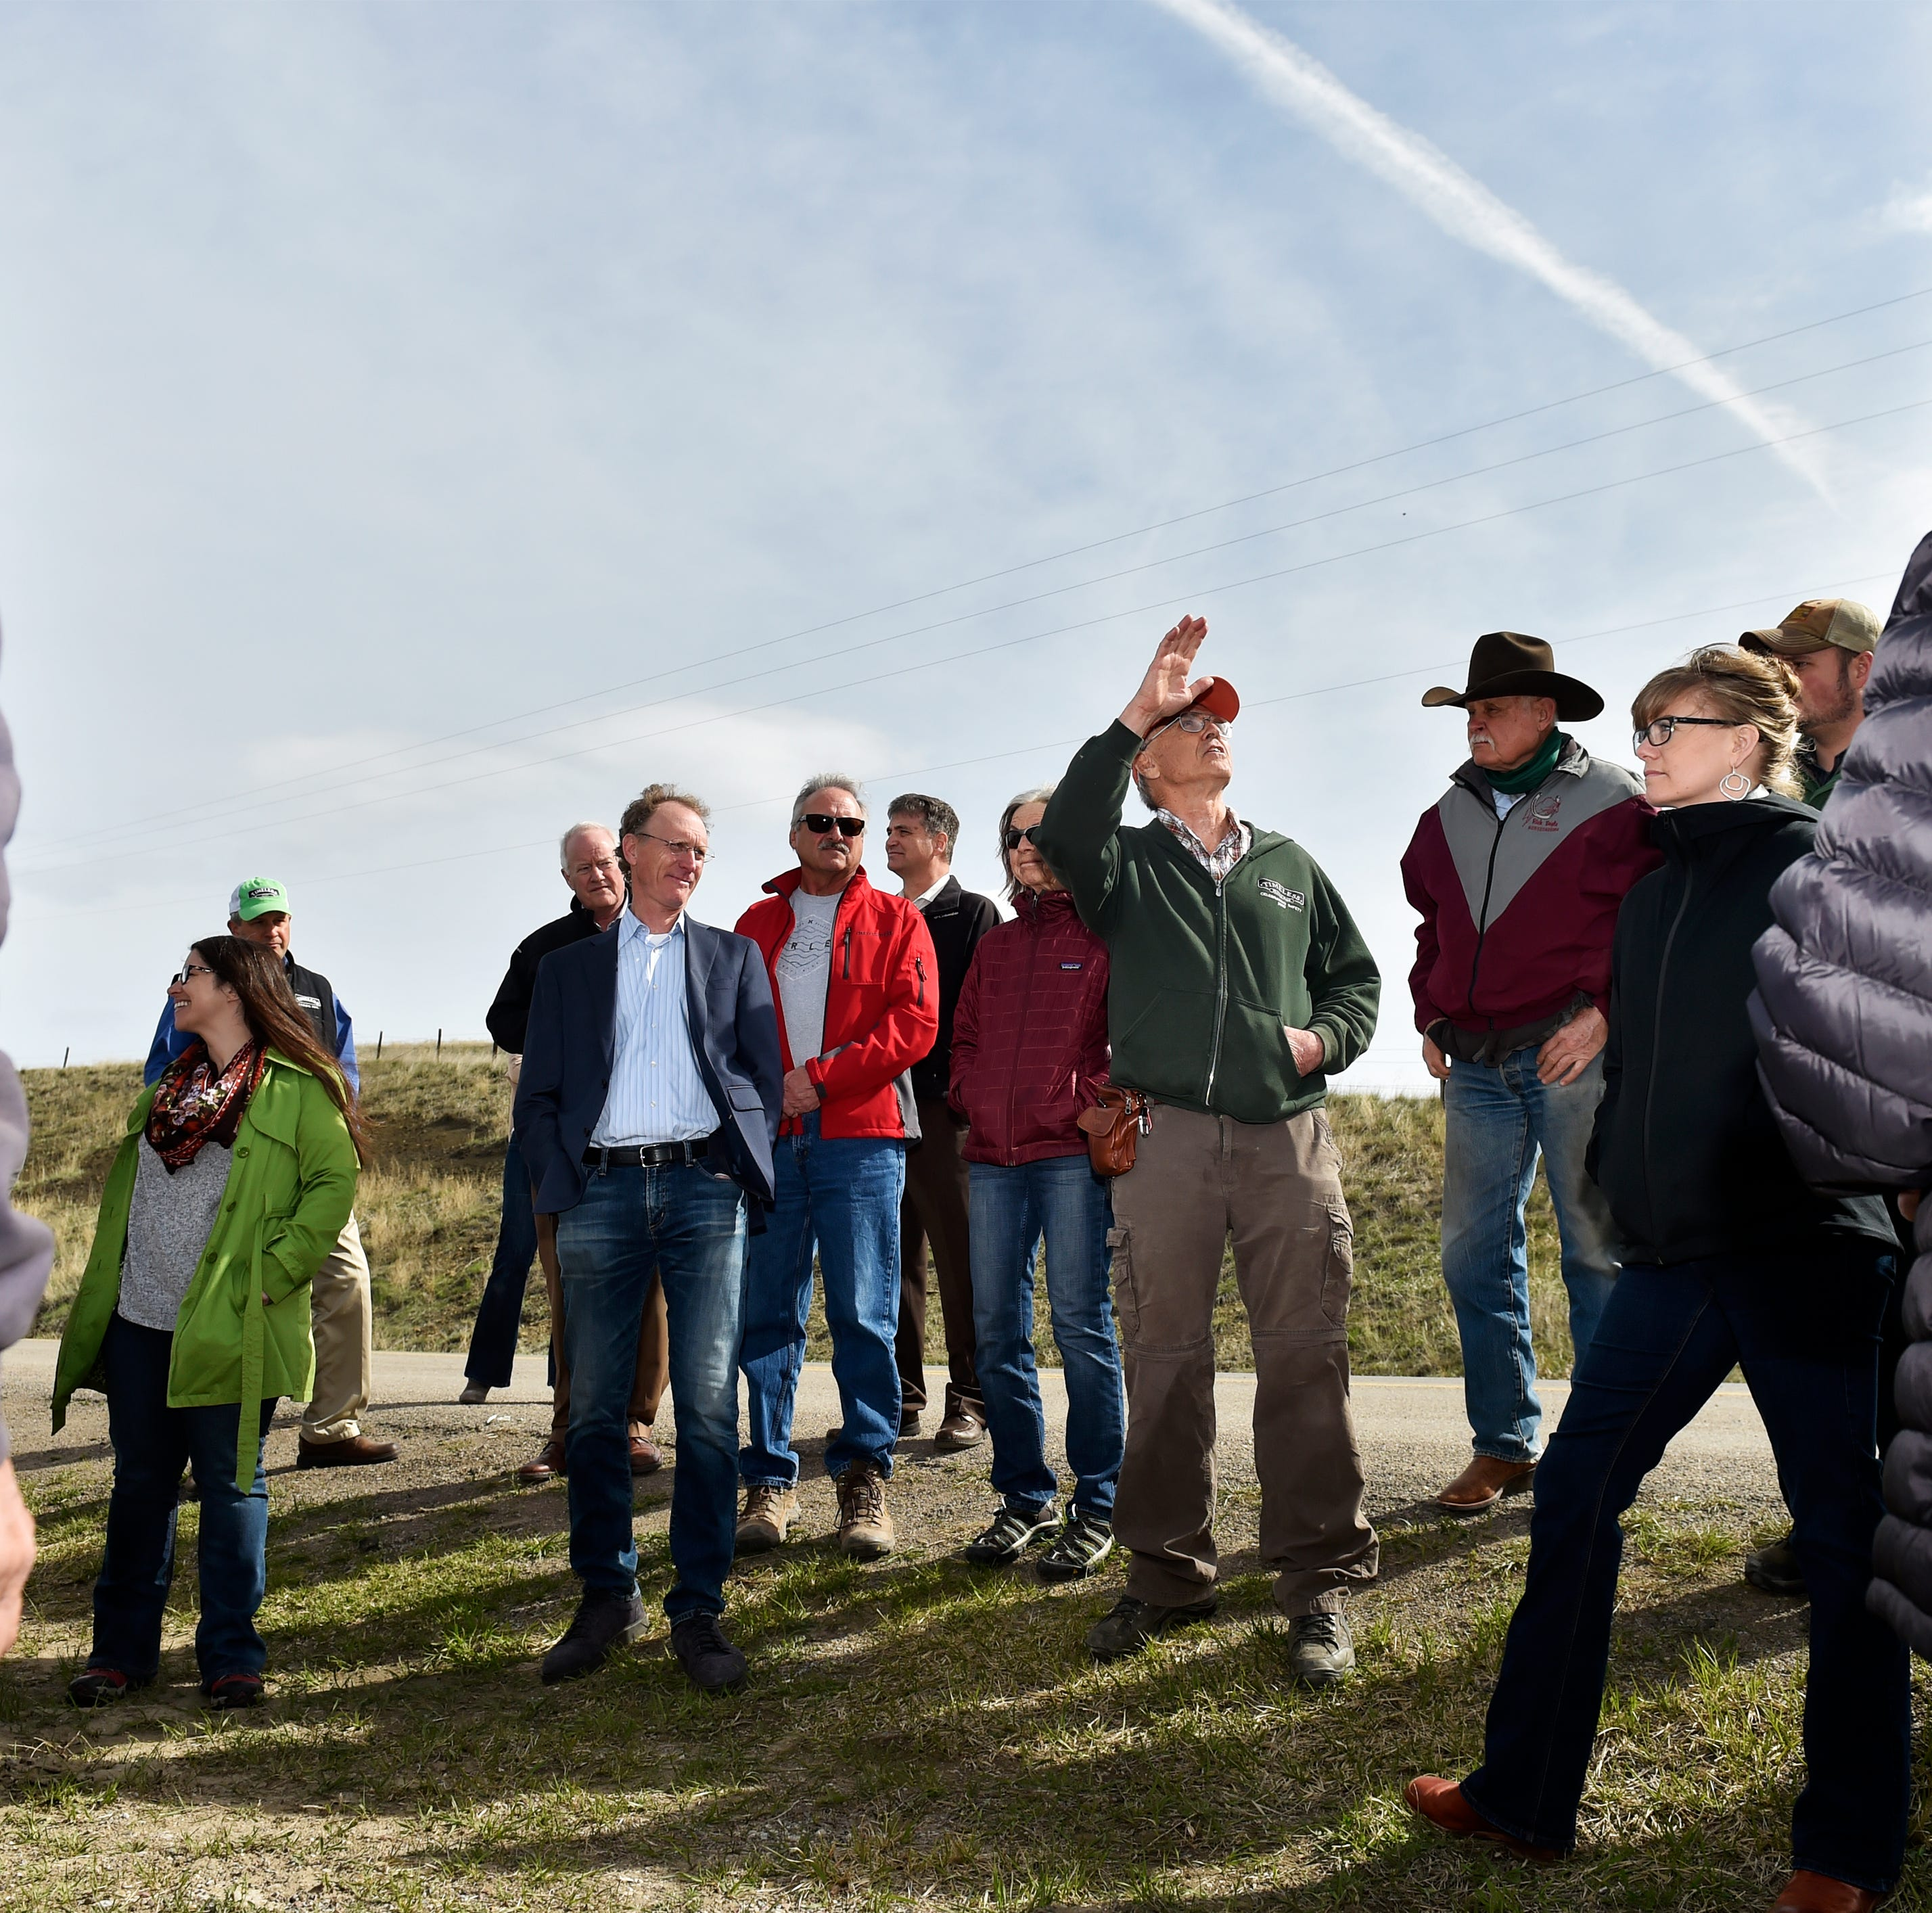 Solar project at Ulm organic seed processor shines light on rural Montana